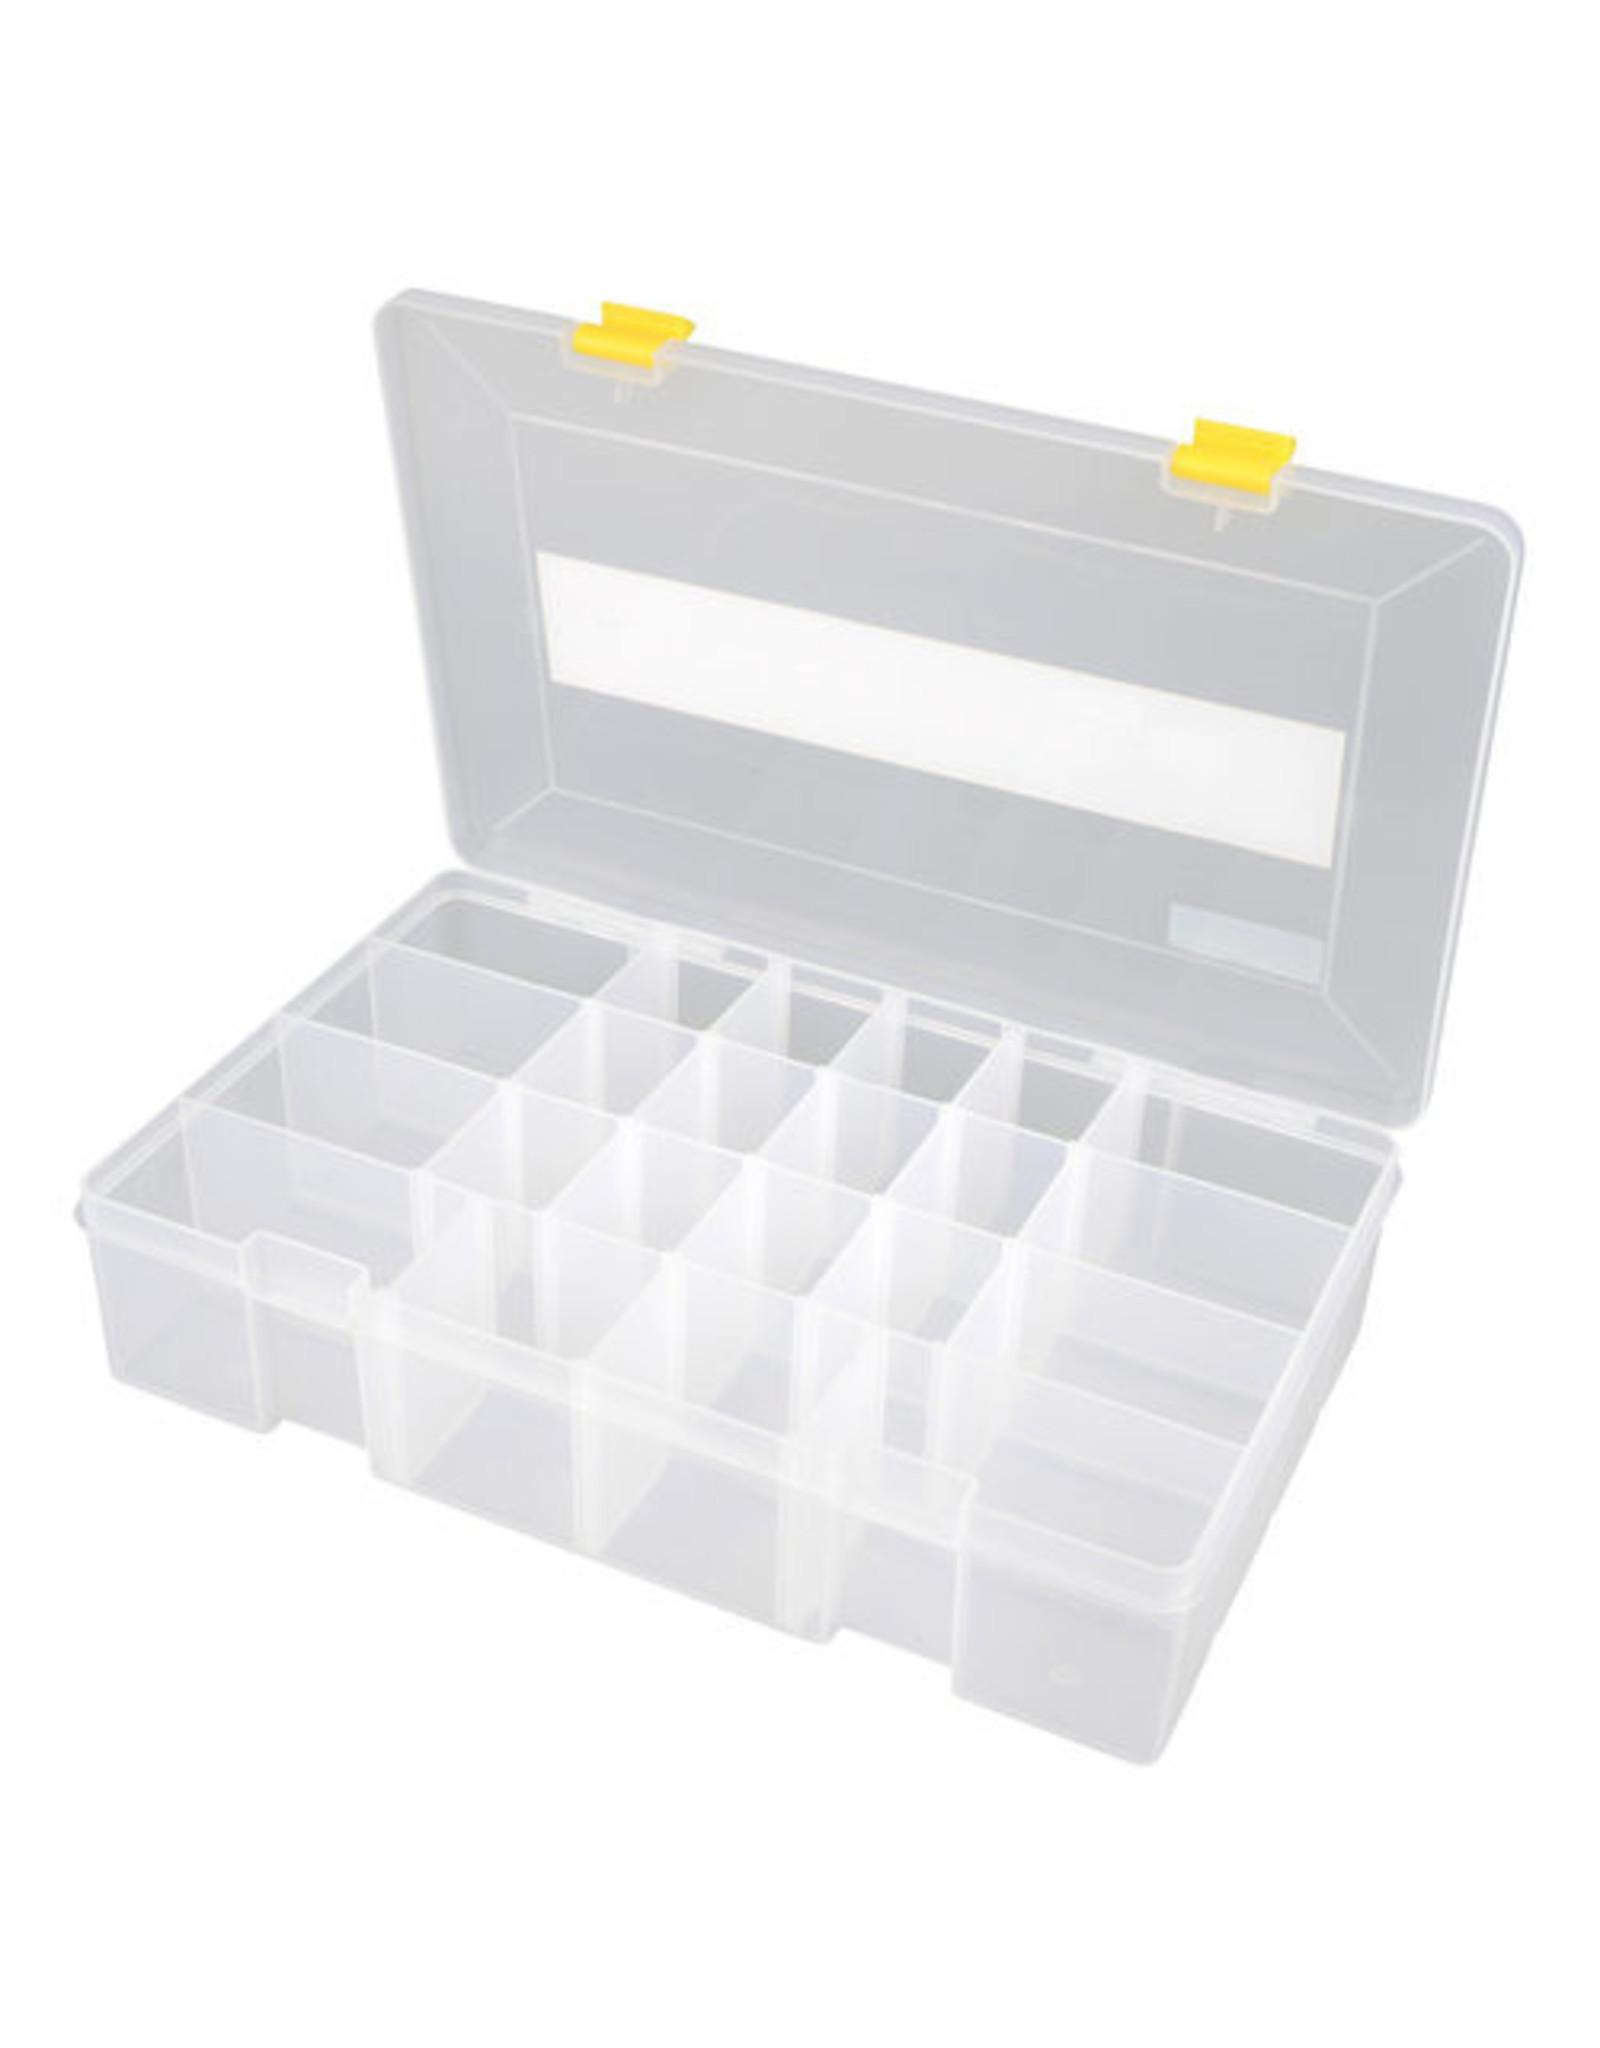 SPRO Tackle Box 900